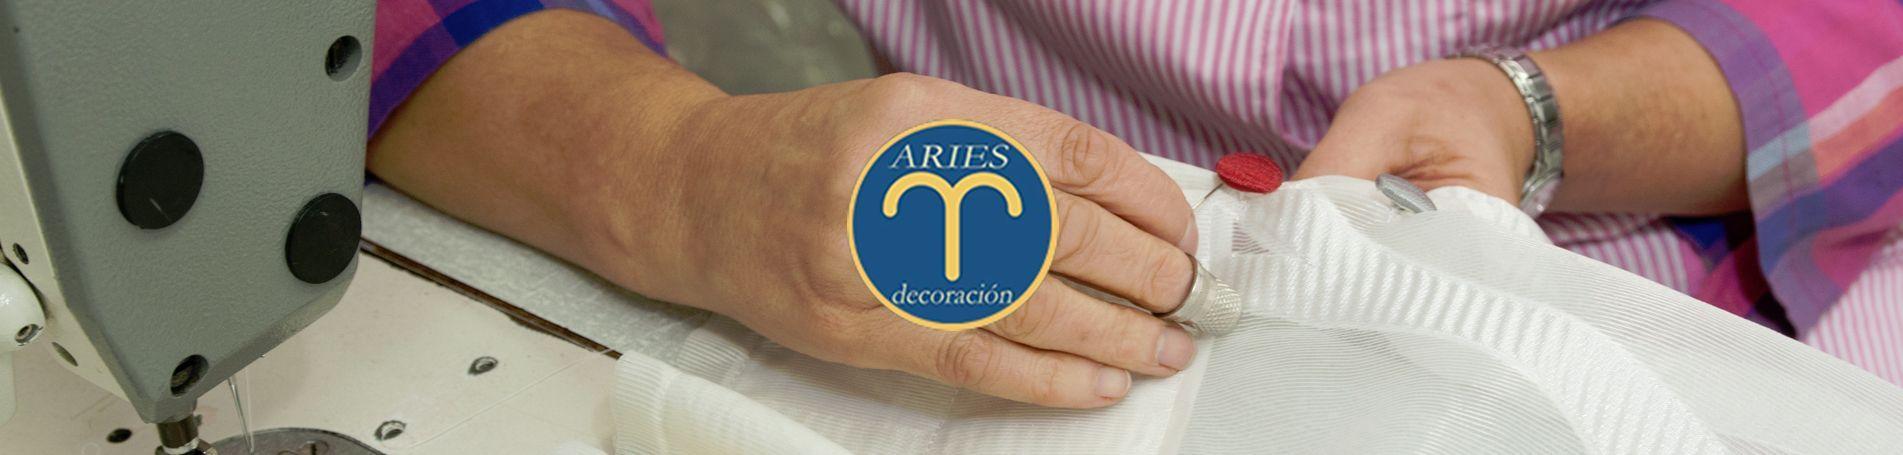 Nueva pagina web para aries decoracion liftingroup for Paginas web decoracion